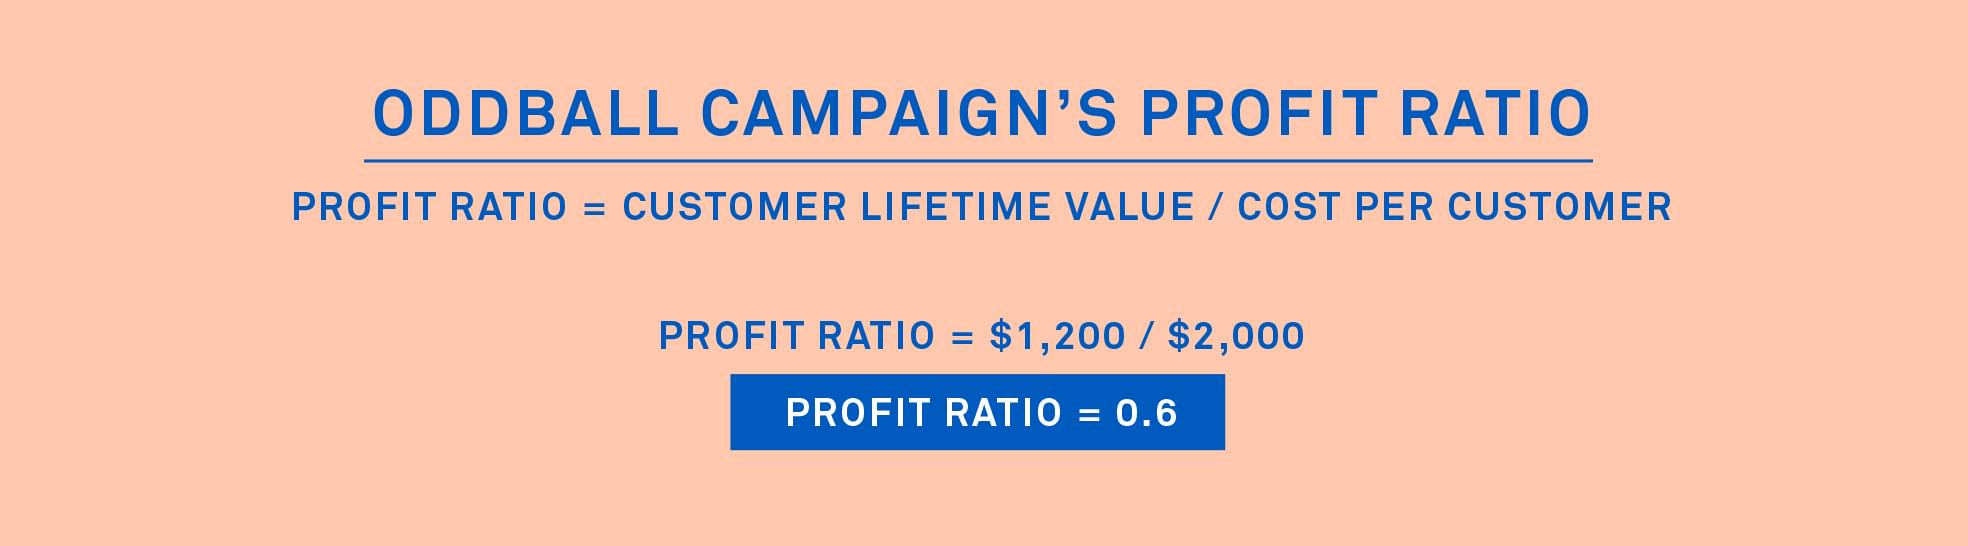 Oddball profit ratio